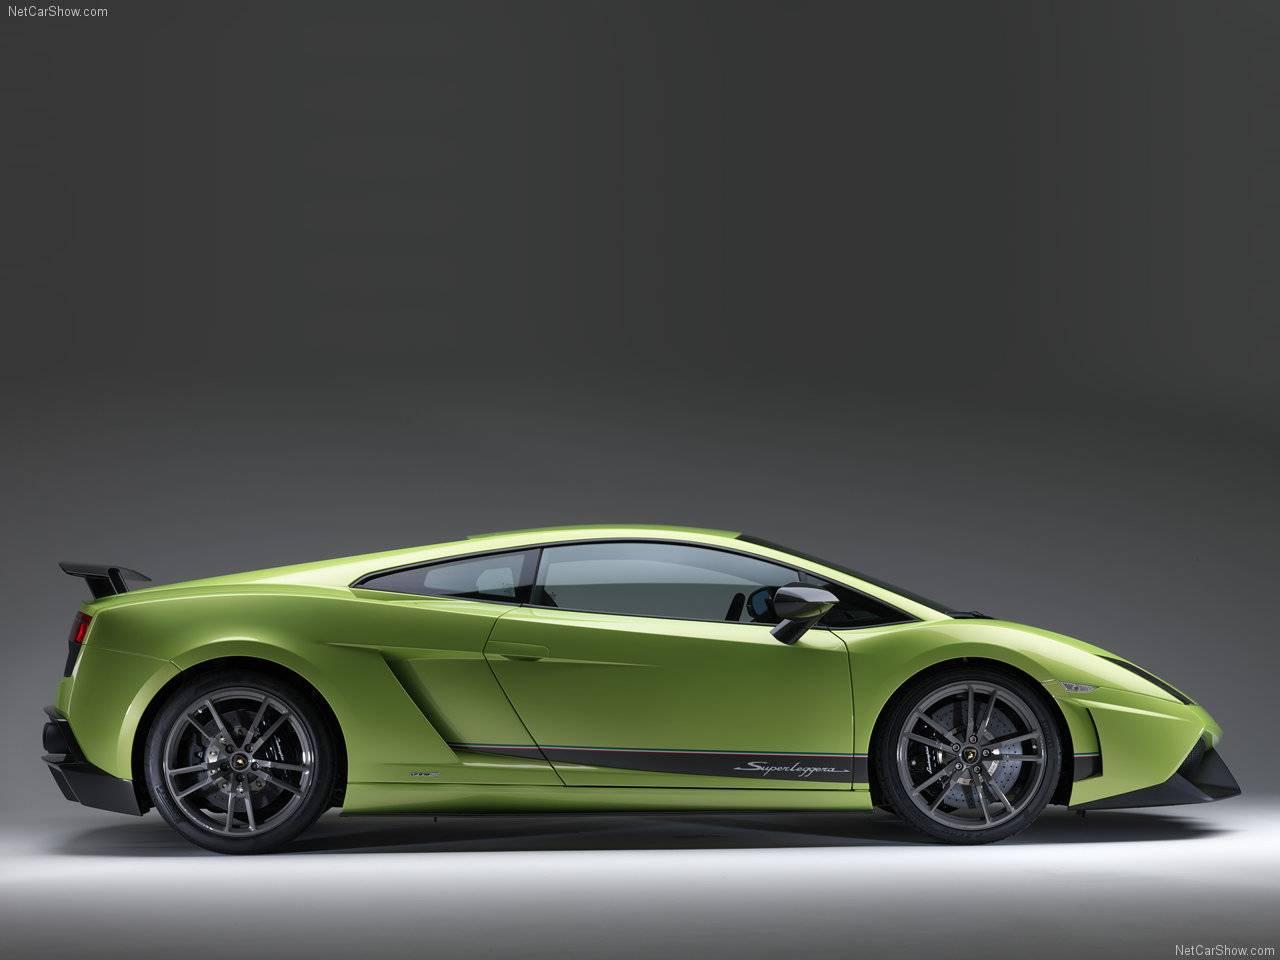 Automotivegeneral 2019 lamborghini aventador interior - Lamborghini aventador interior wallpaper ...